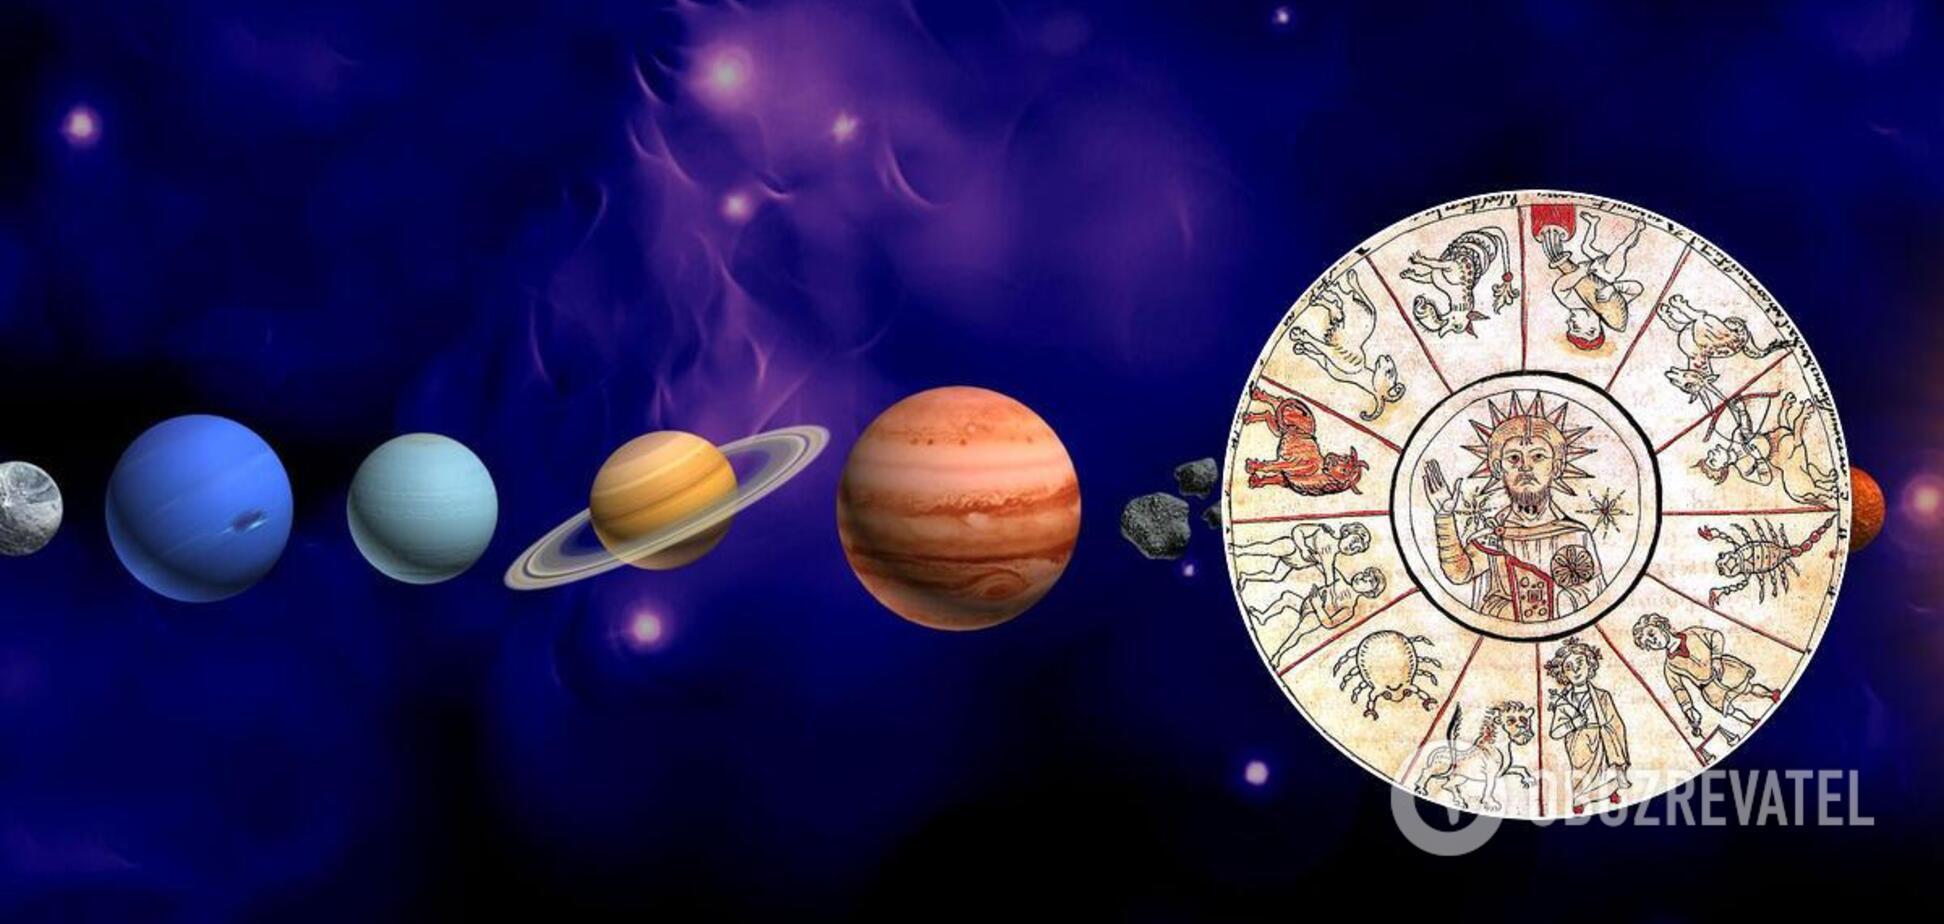 Не парад планет, а небесная Чаша: что происходит на небе